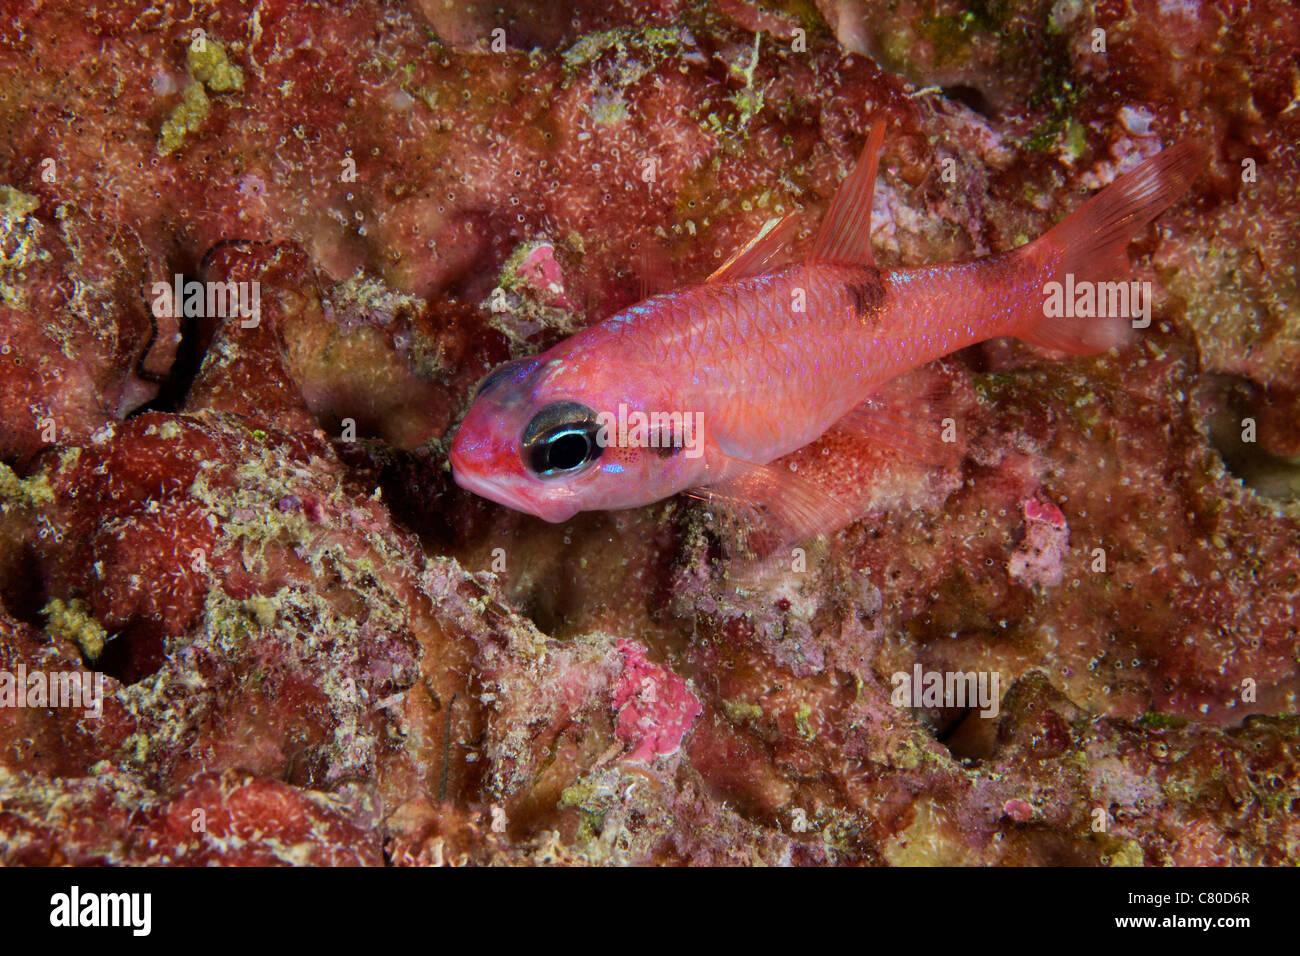 Kardinalbarschen, Bonaire, Karibik Niederlande zu imitieren. Stockbild